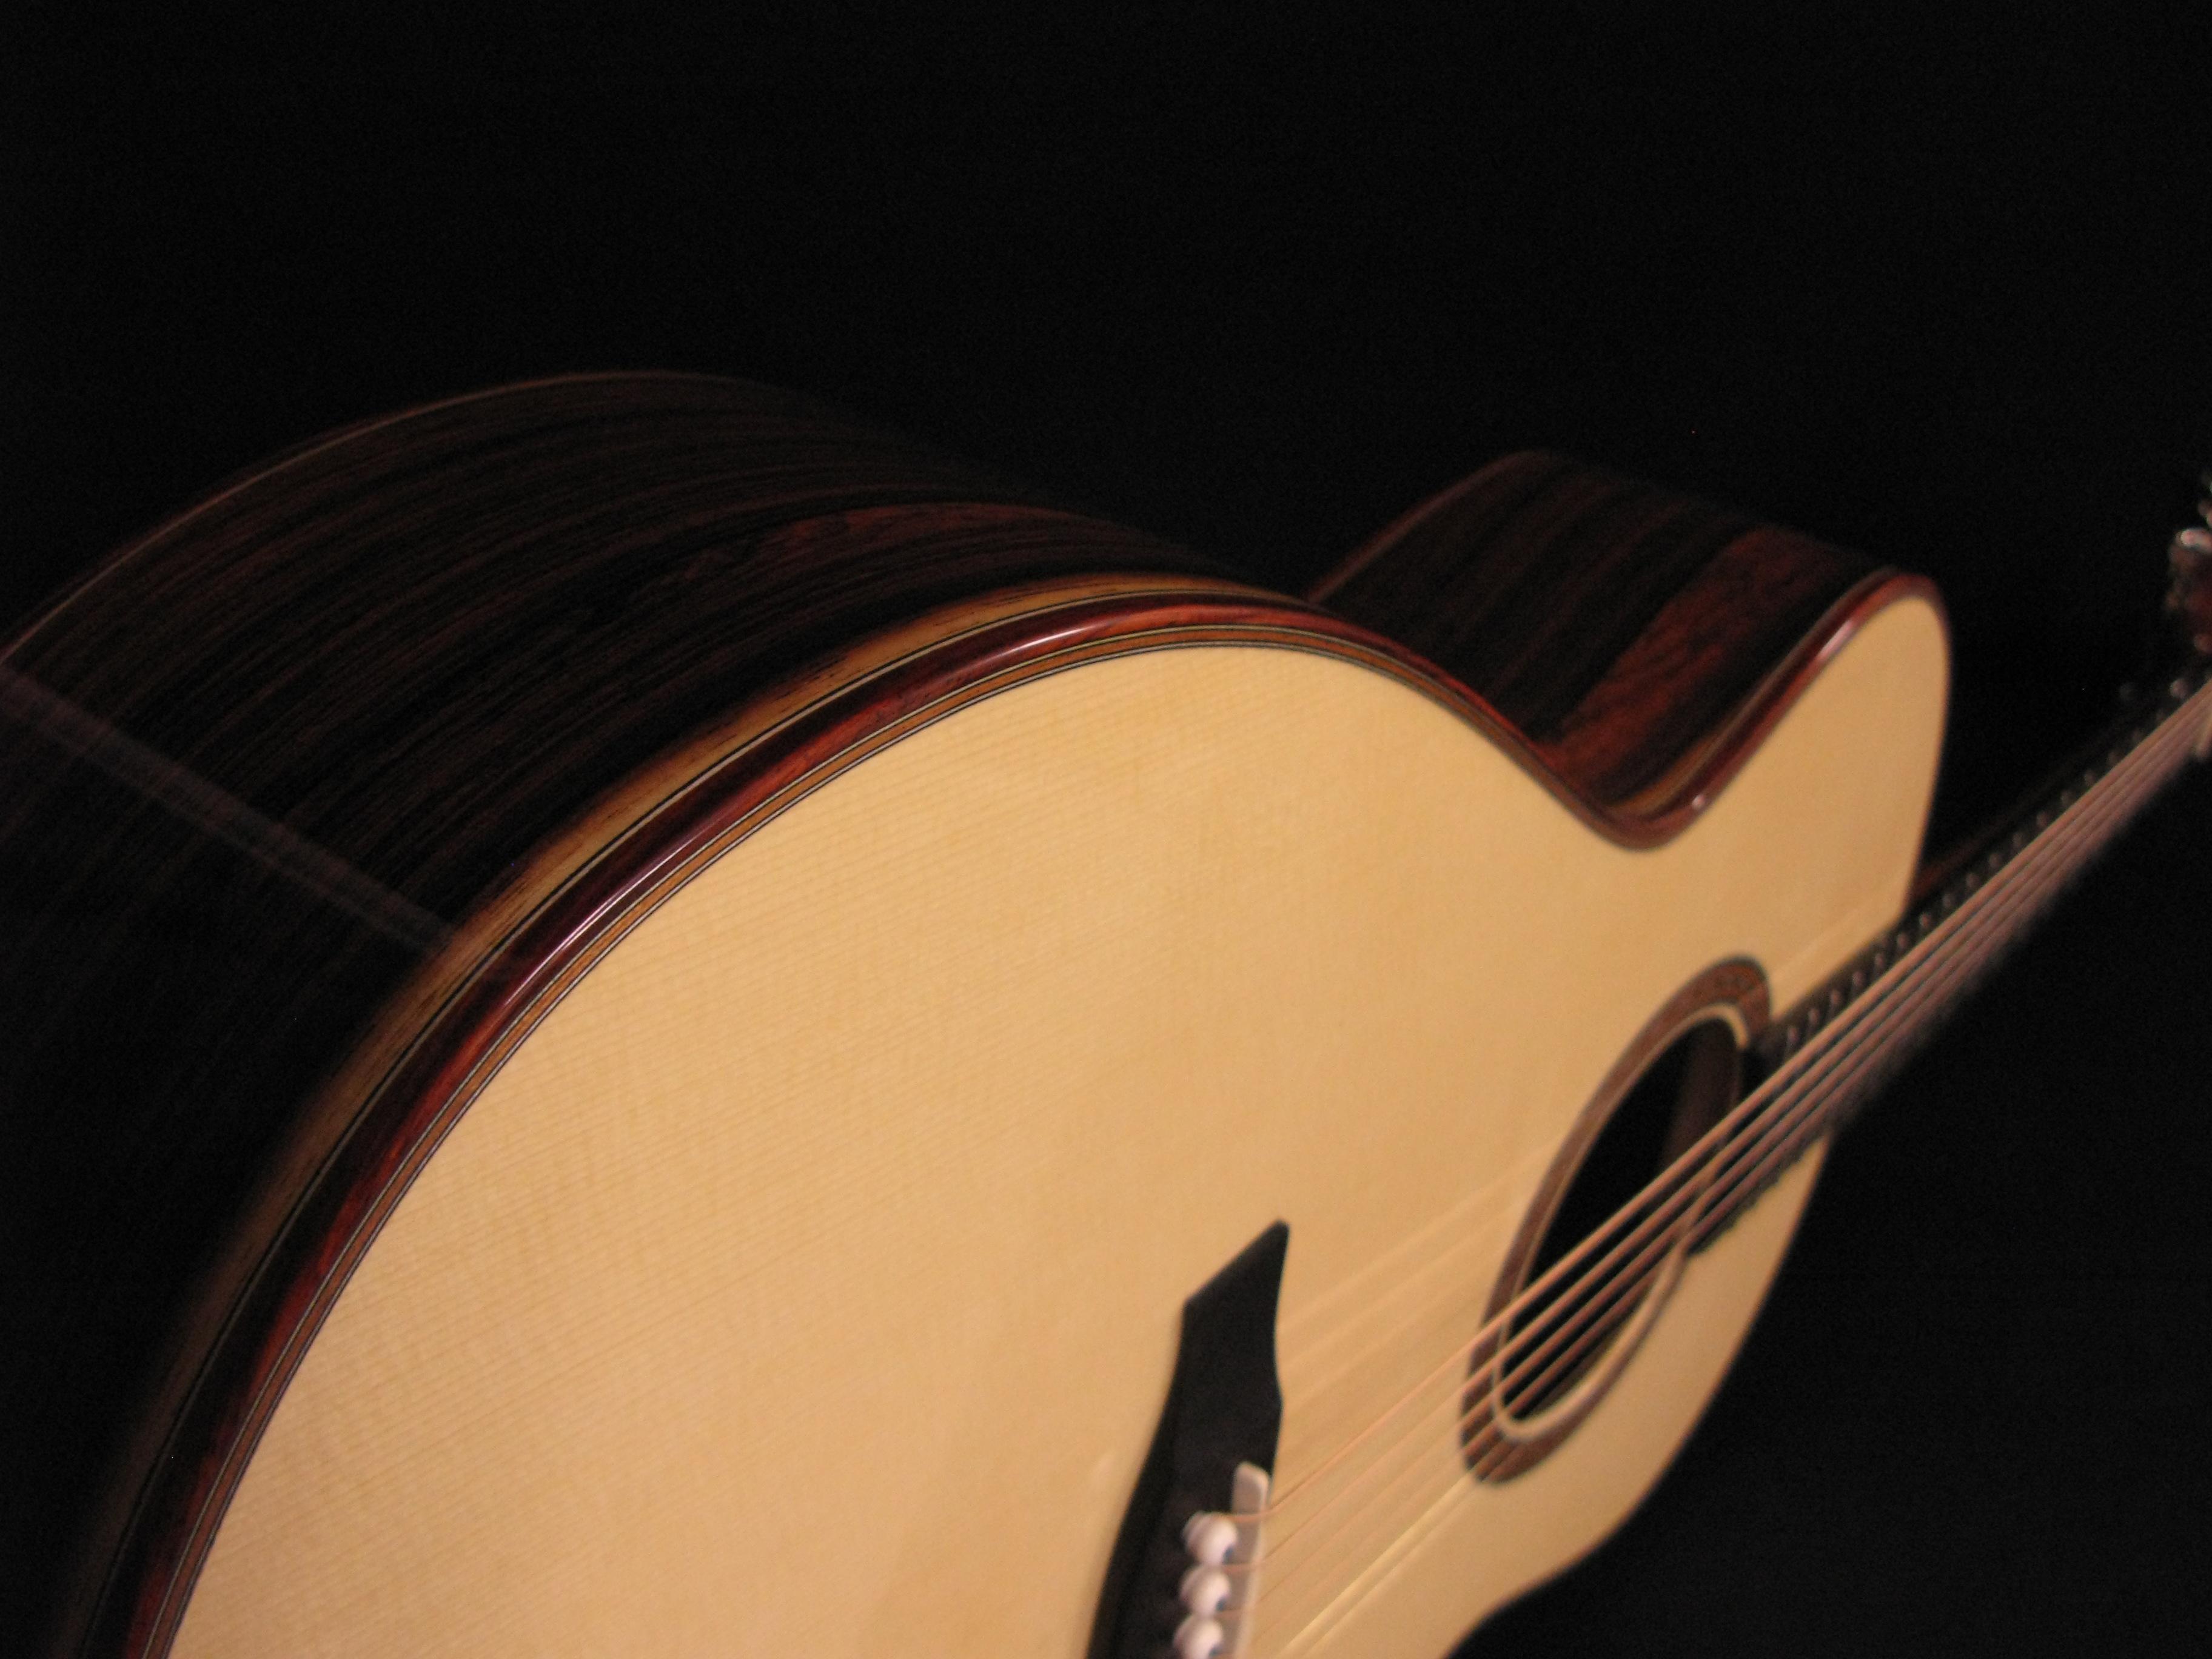 Akustinen kitara brw